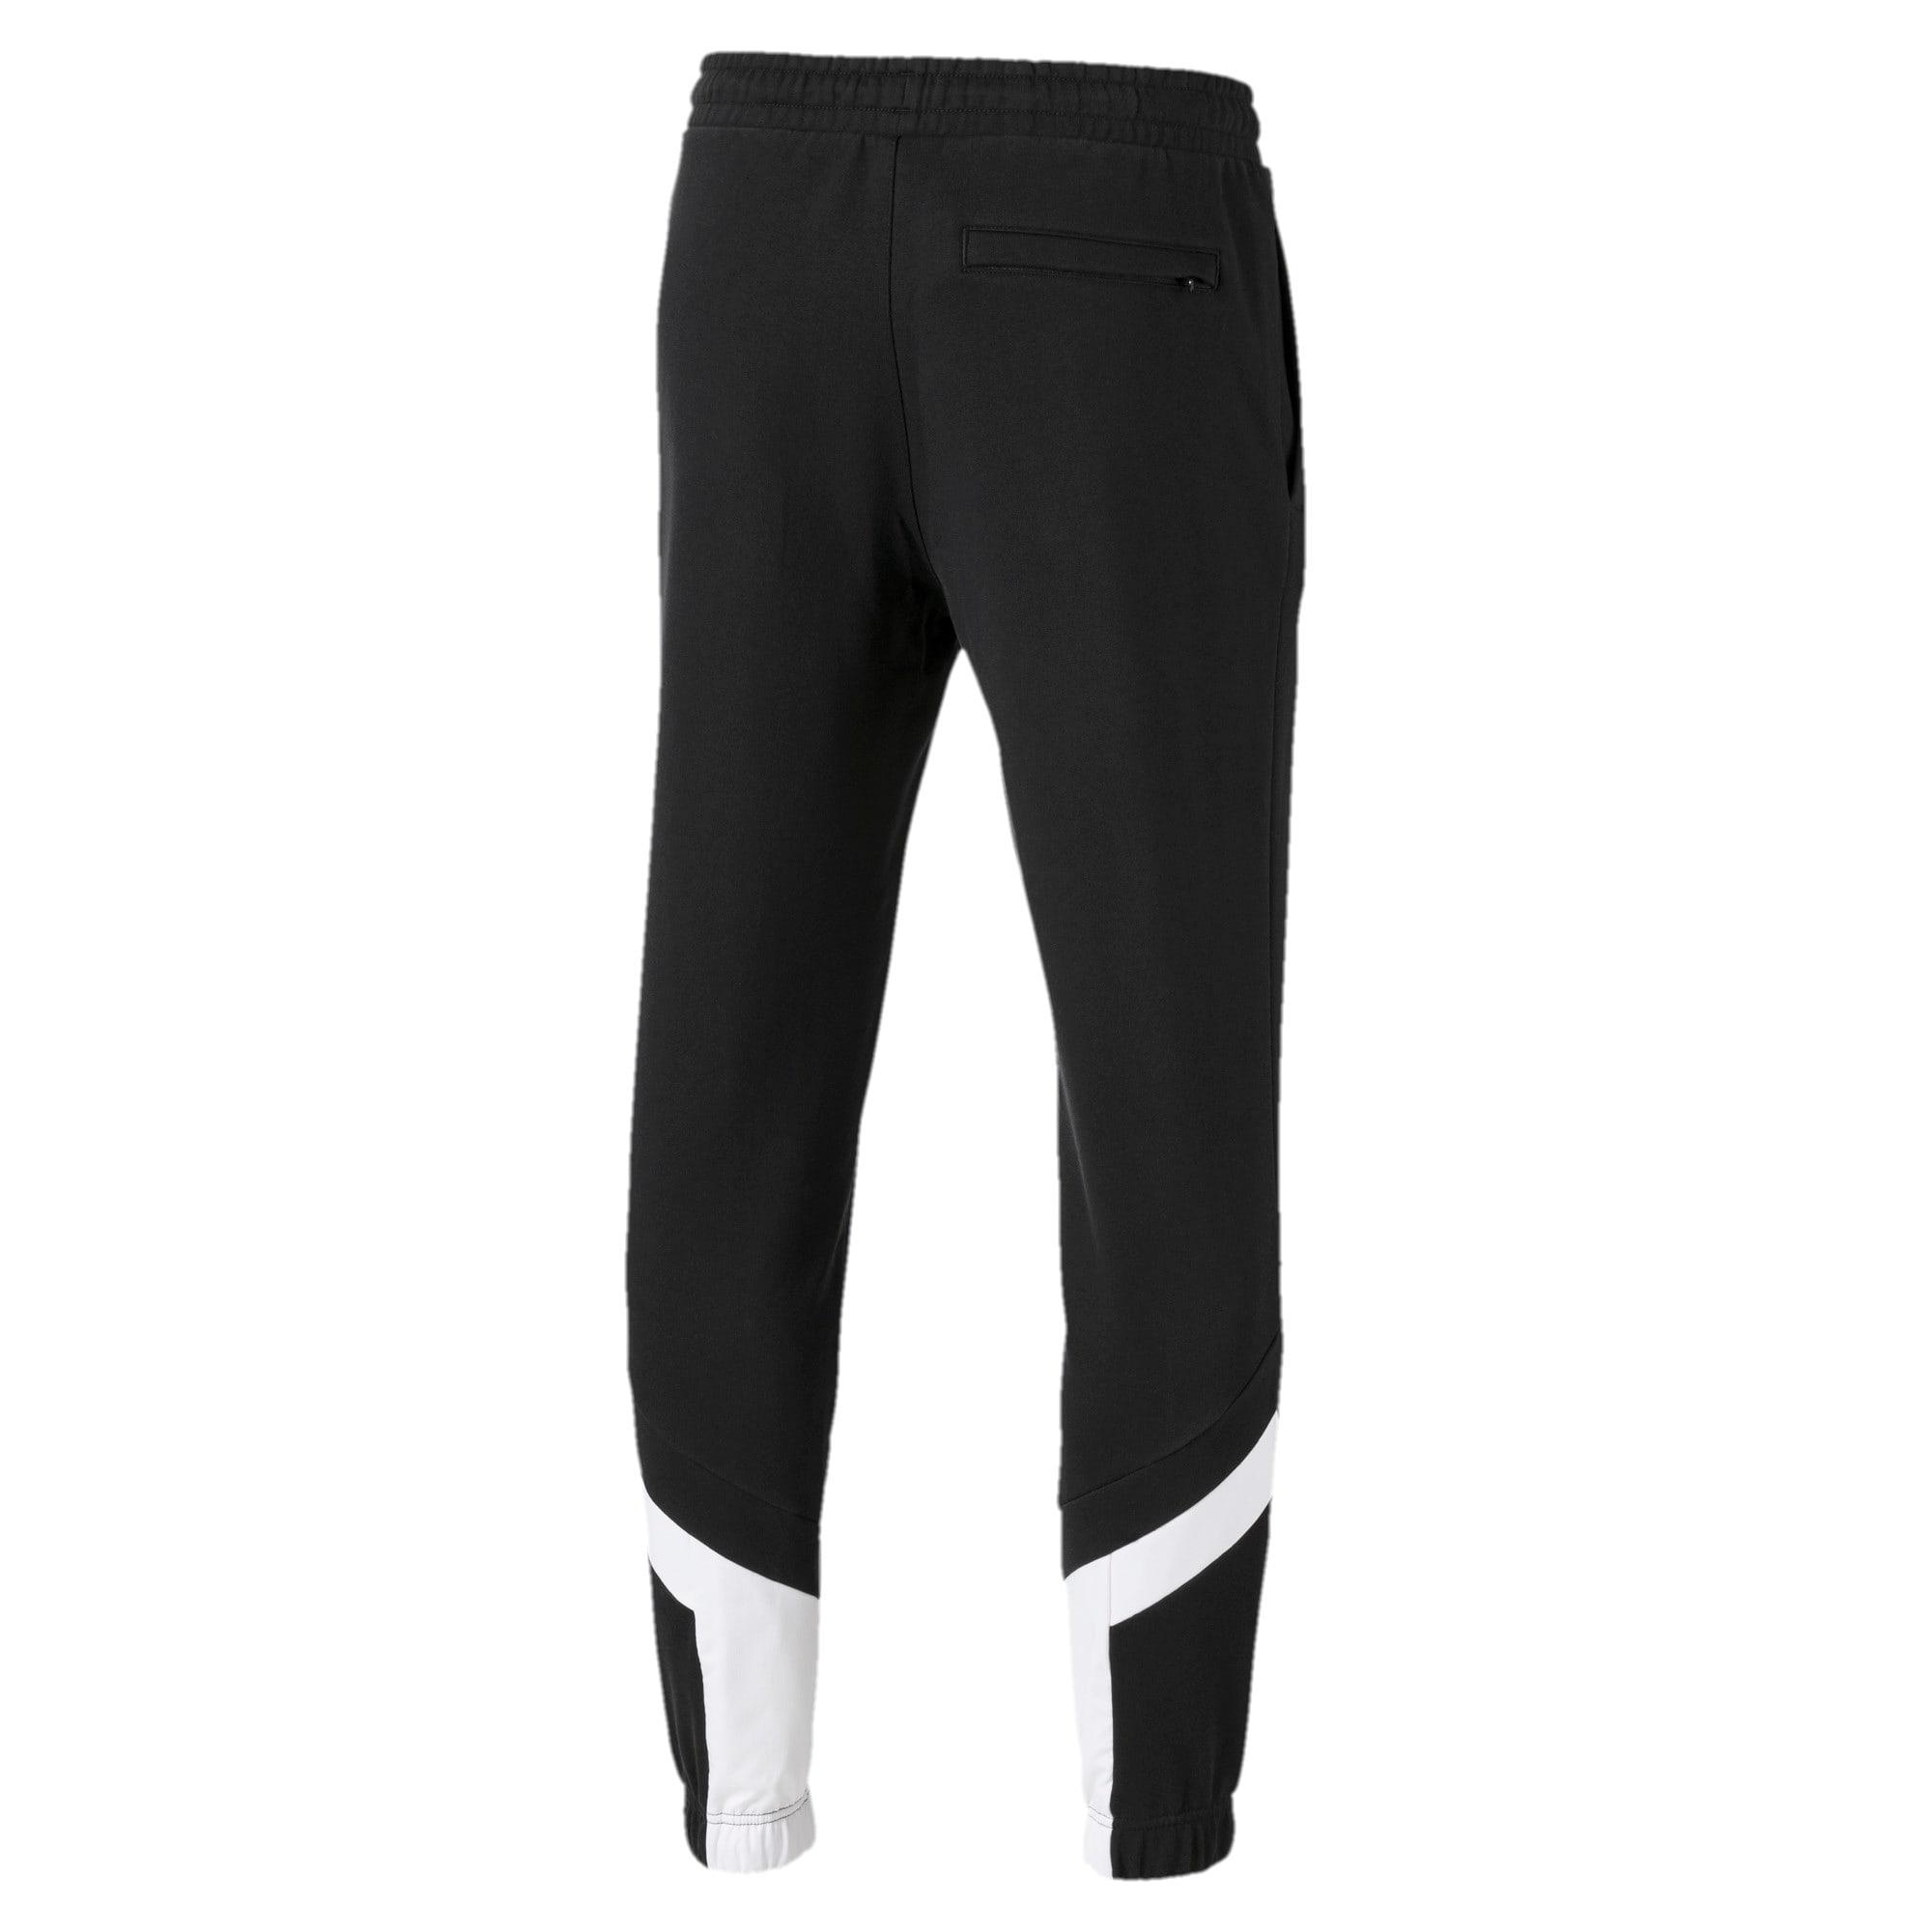 Miniatura 5 de Pantalones deportivos Iconic MCS de hombre, Puma Black, mediano